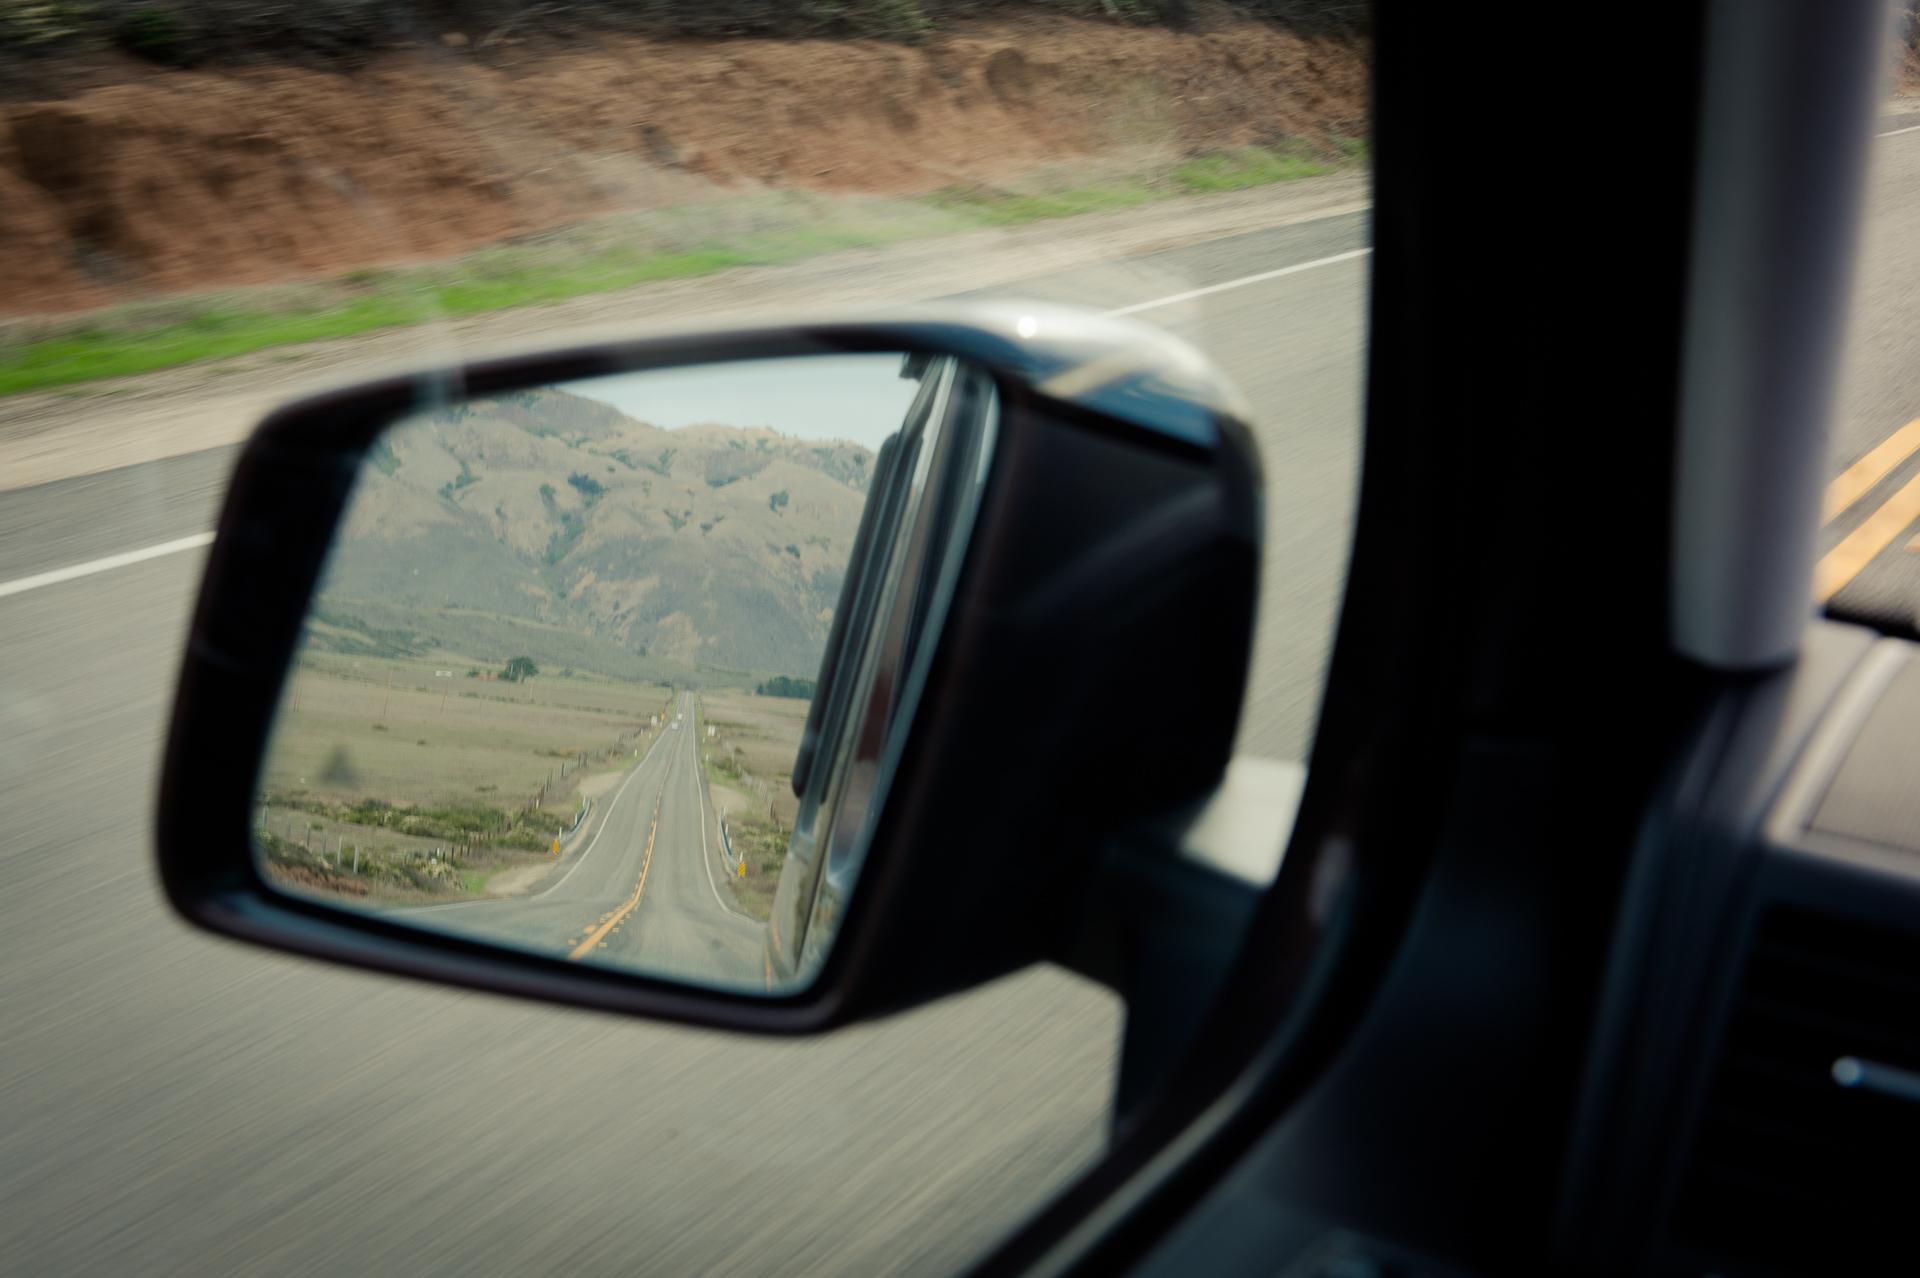 2014-Mercedes-Benz-G500-G550-braun-Kalifornien-mbrt14-07